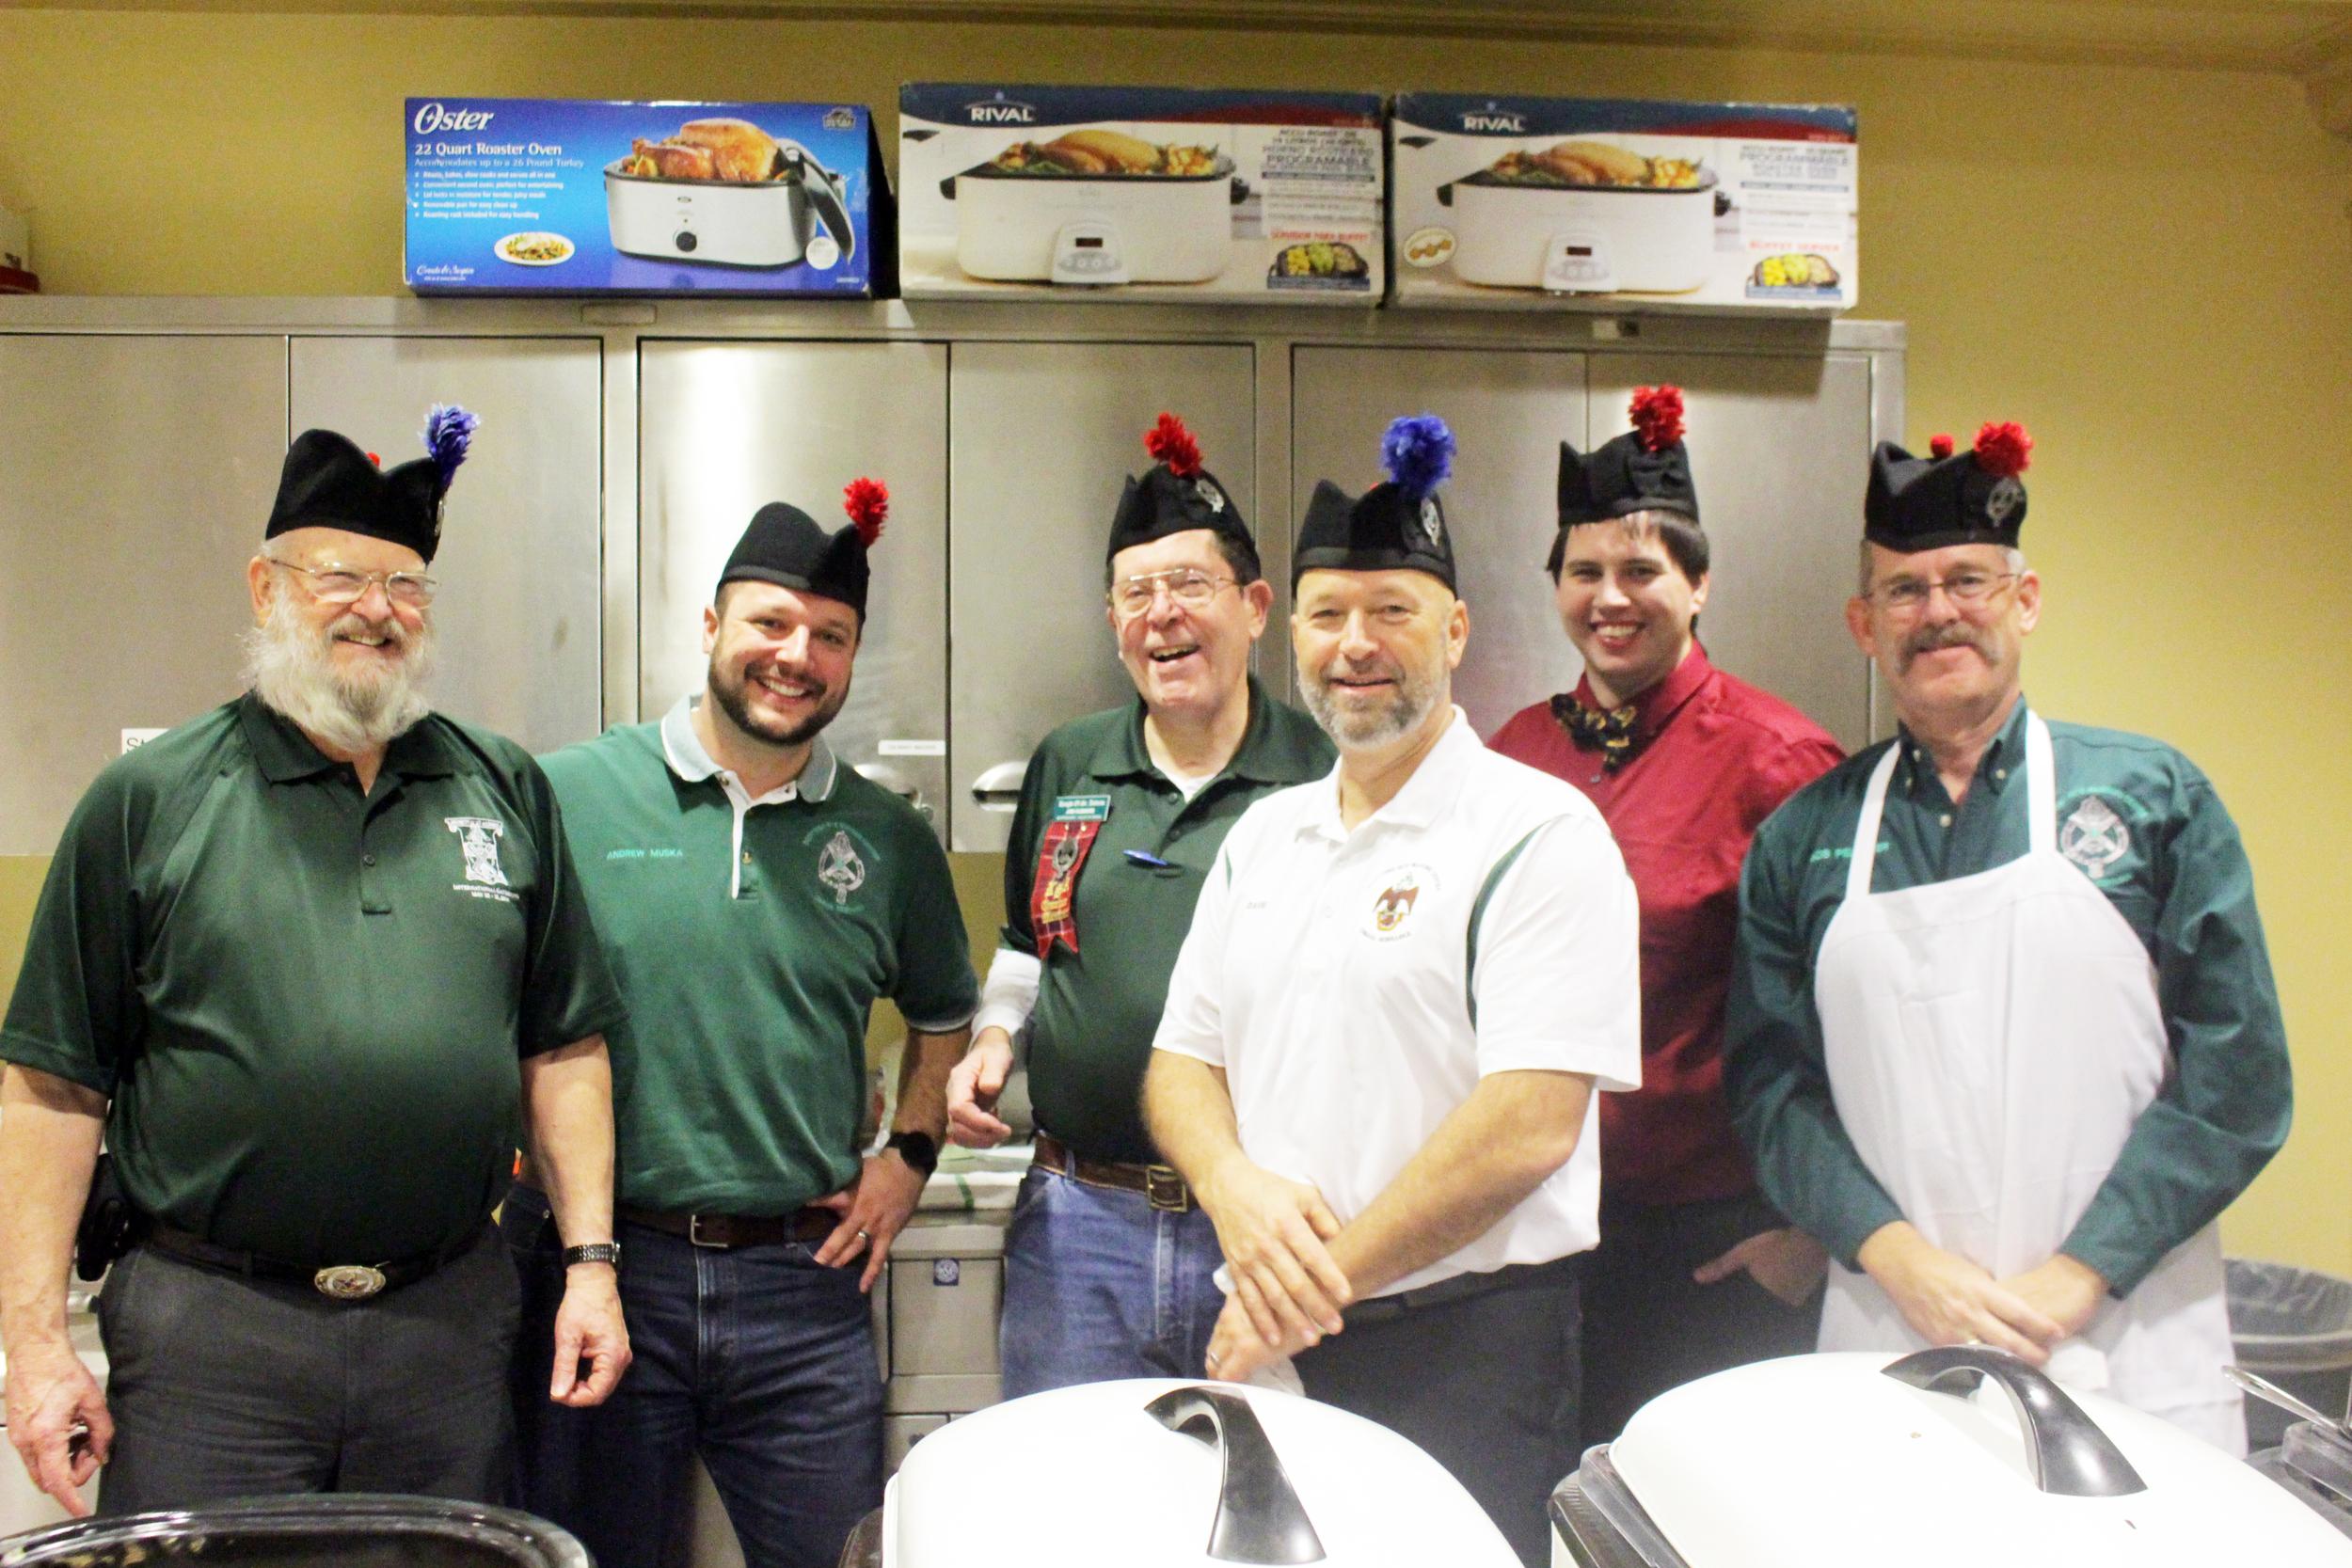 Omaha Knights of St. Andrew serving breakfast at the November, 2015 Reunion: Brothers Carl Highman, 32°, Andrew Muska, 32°, Jim Flowers, 32°, David Meinzer, 32°, Kyle Beckner, 32°, and Robert Pelletier, 32°